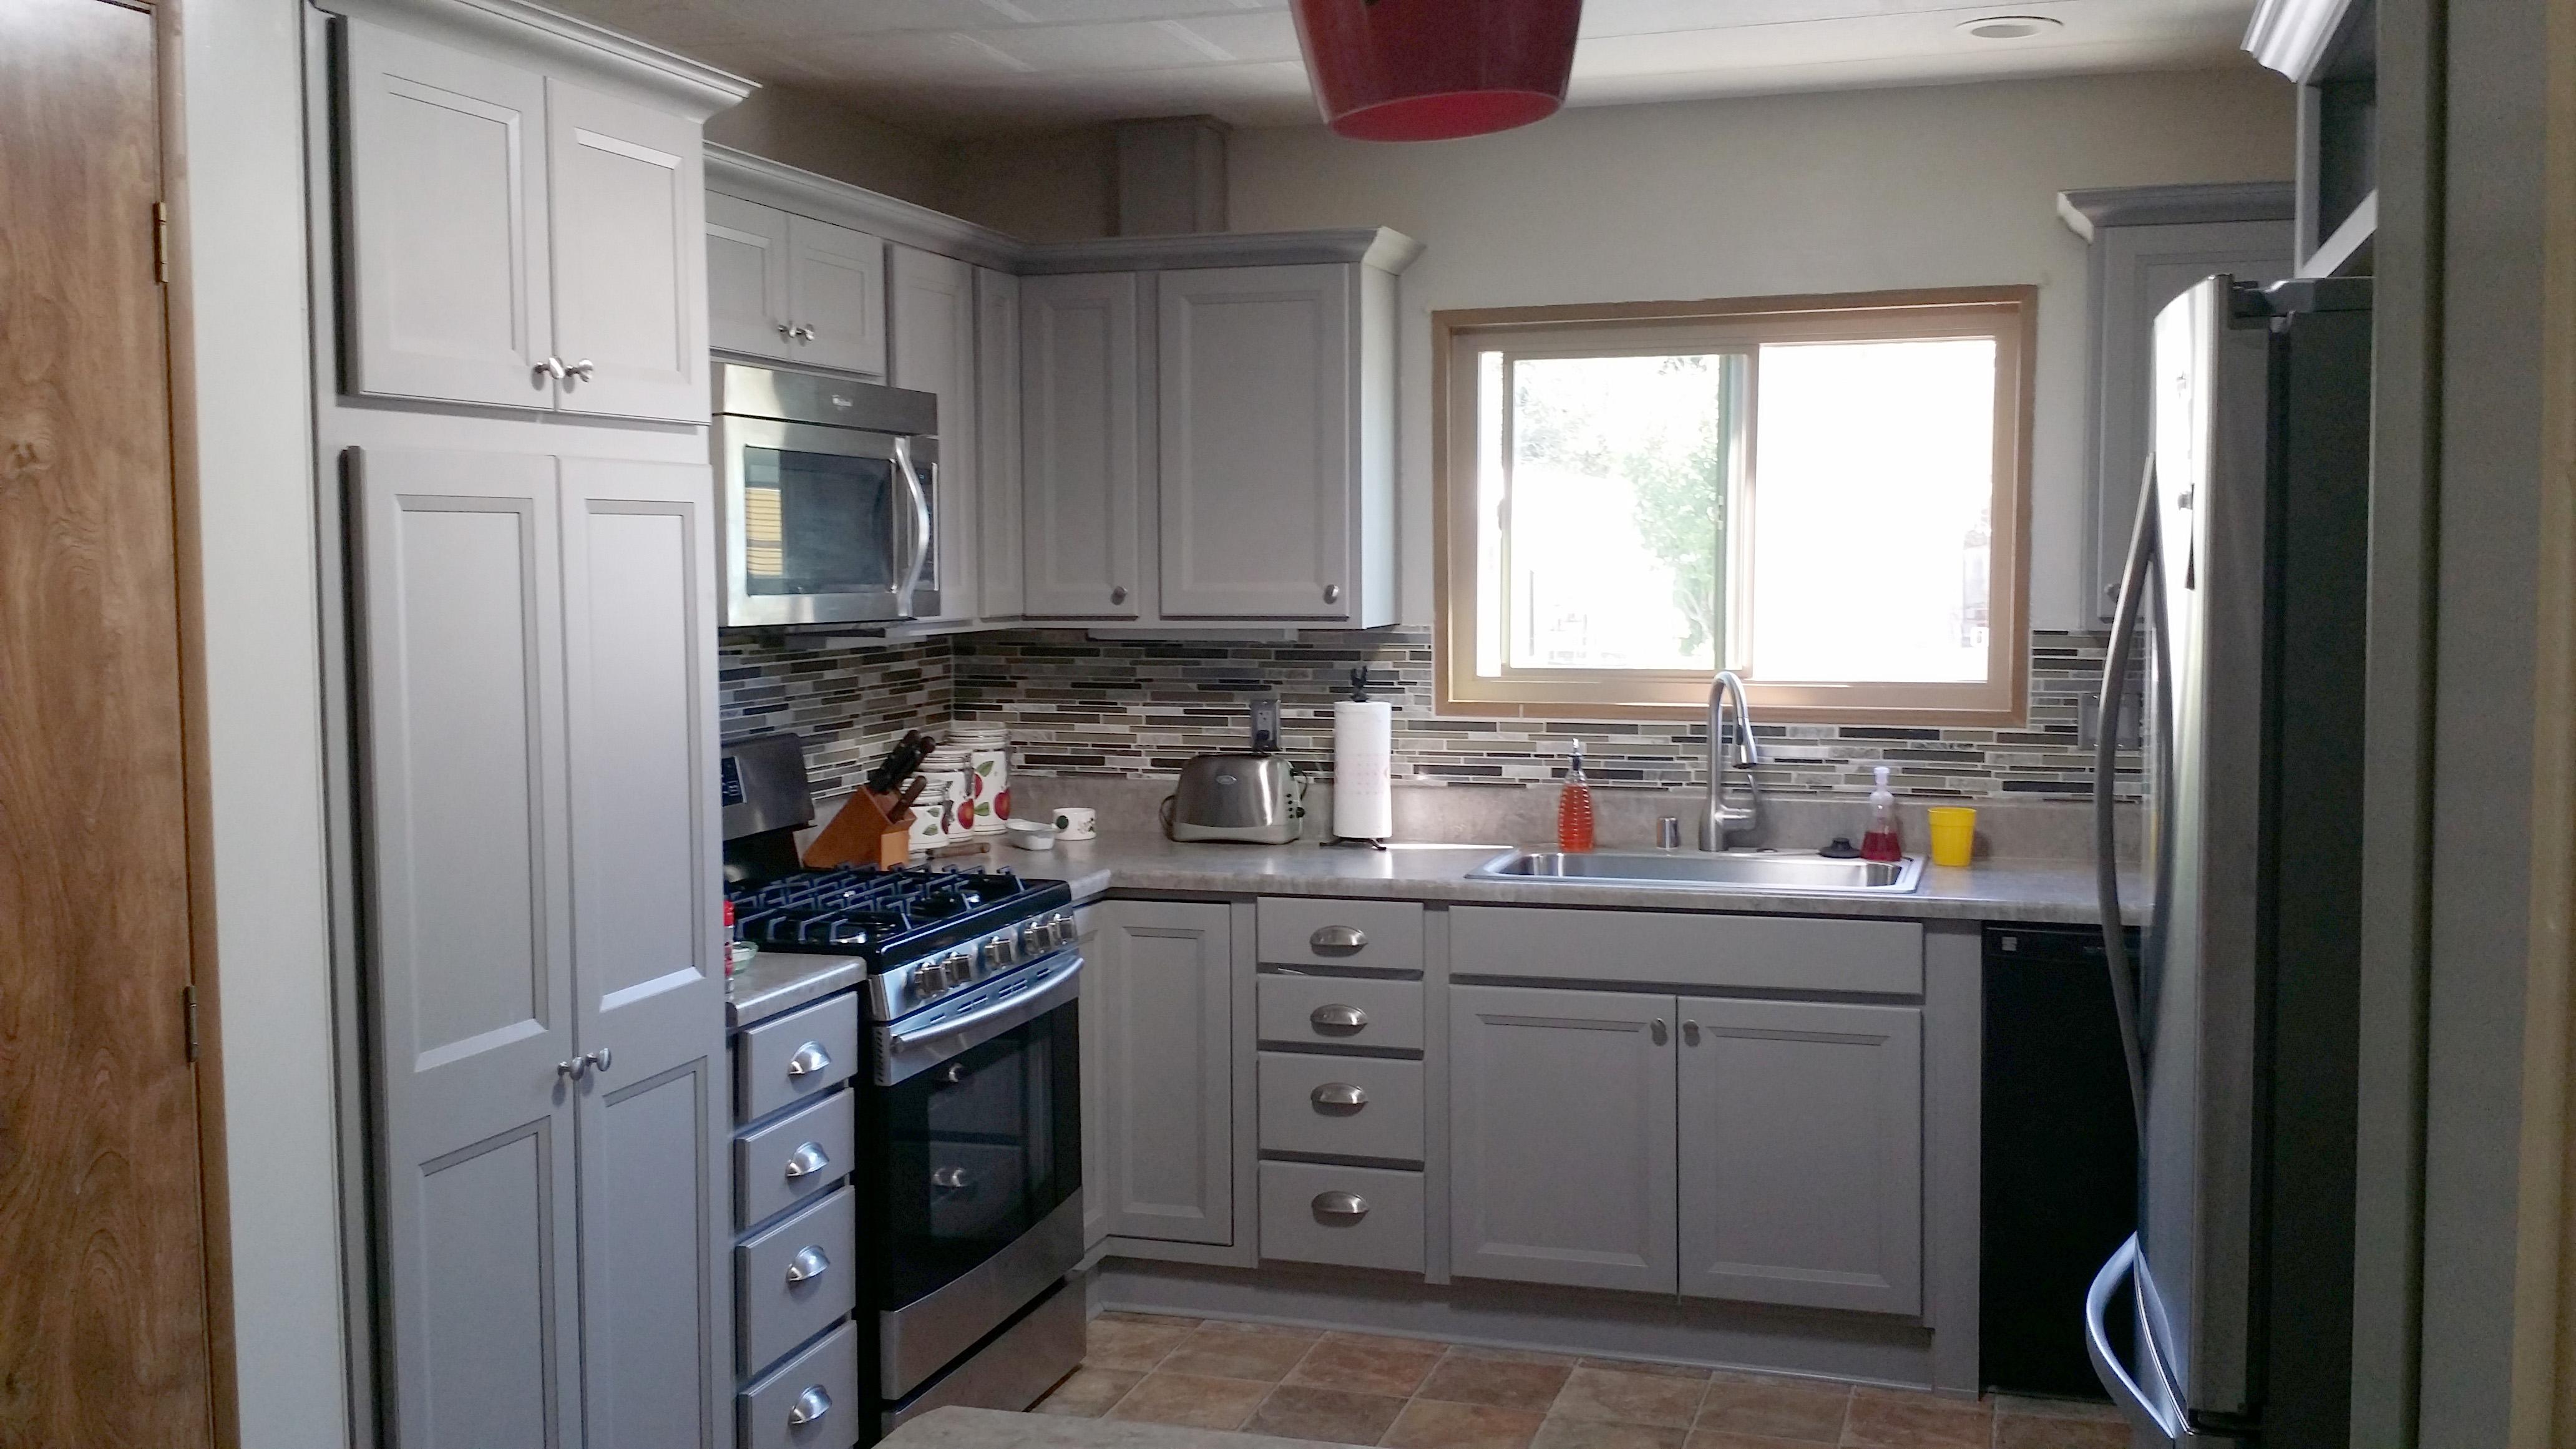 Range and cabinets, light grey.